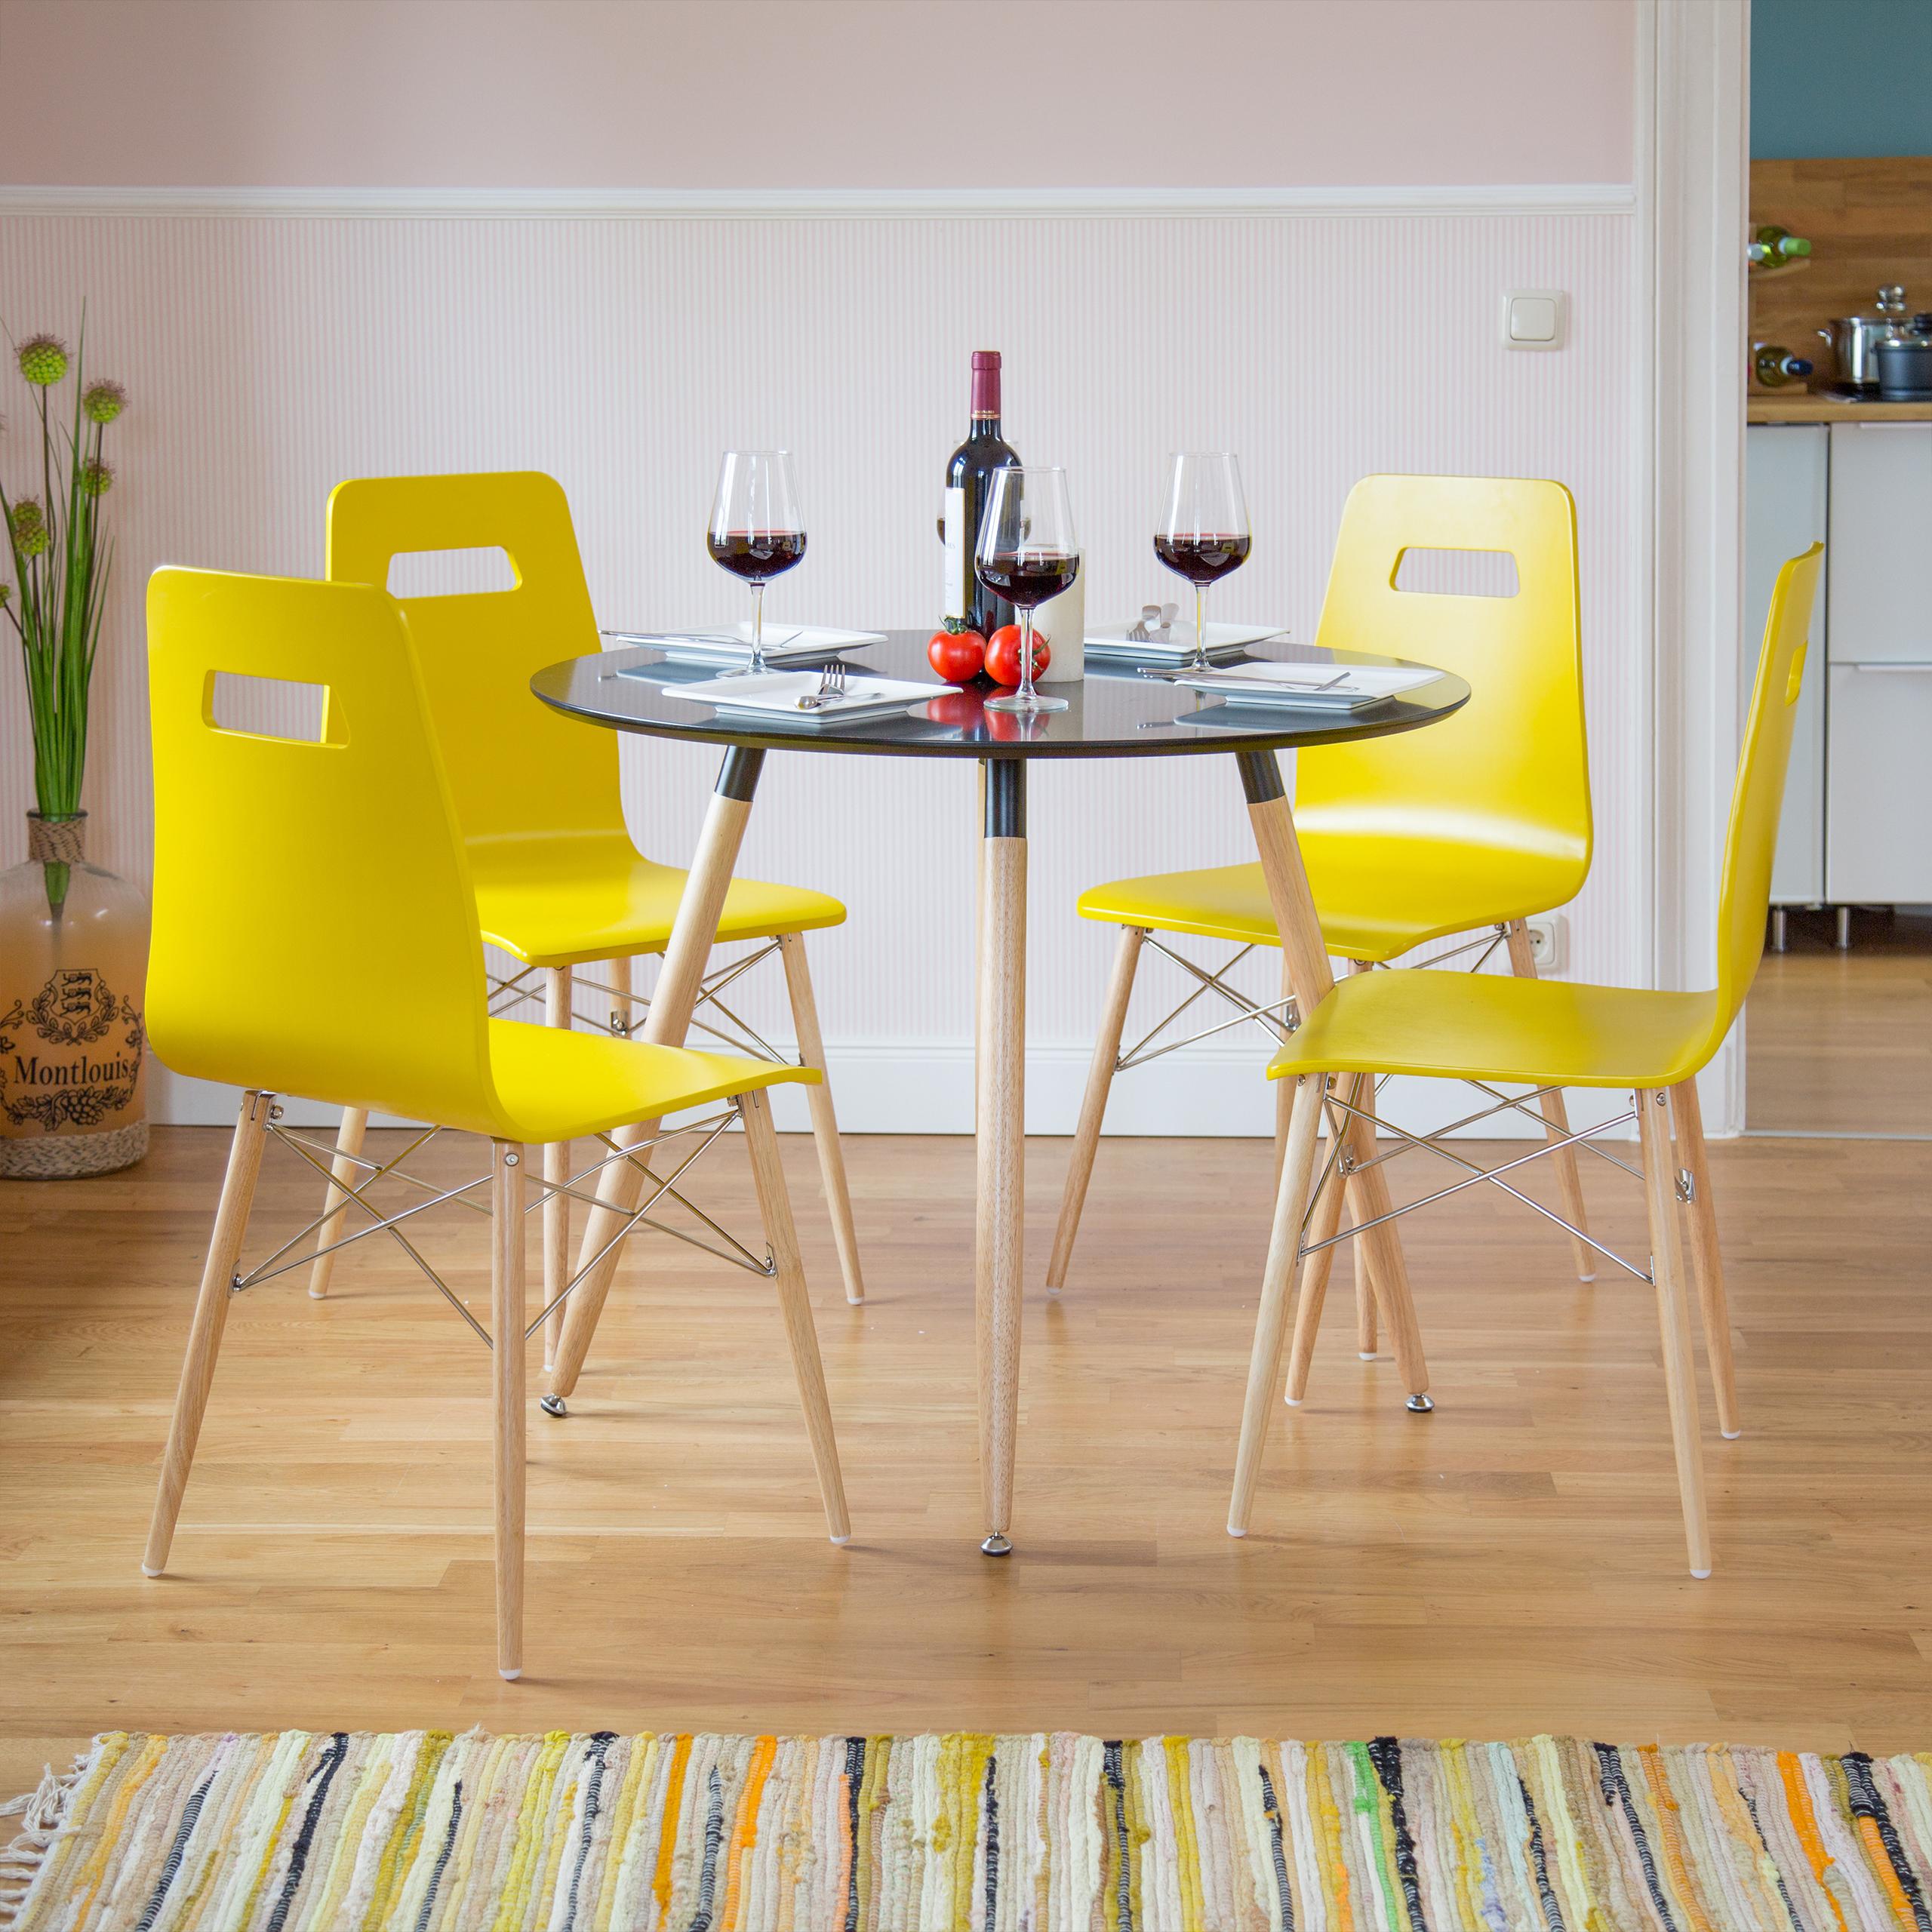 Design Stuhl 4er Set, Esszimmerstuhl, Sitzgruppe modern, bunt, Retro ...